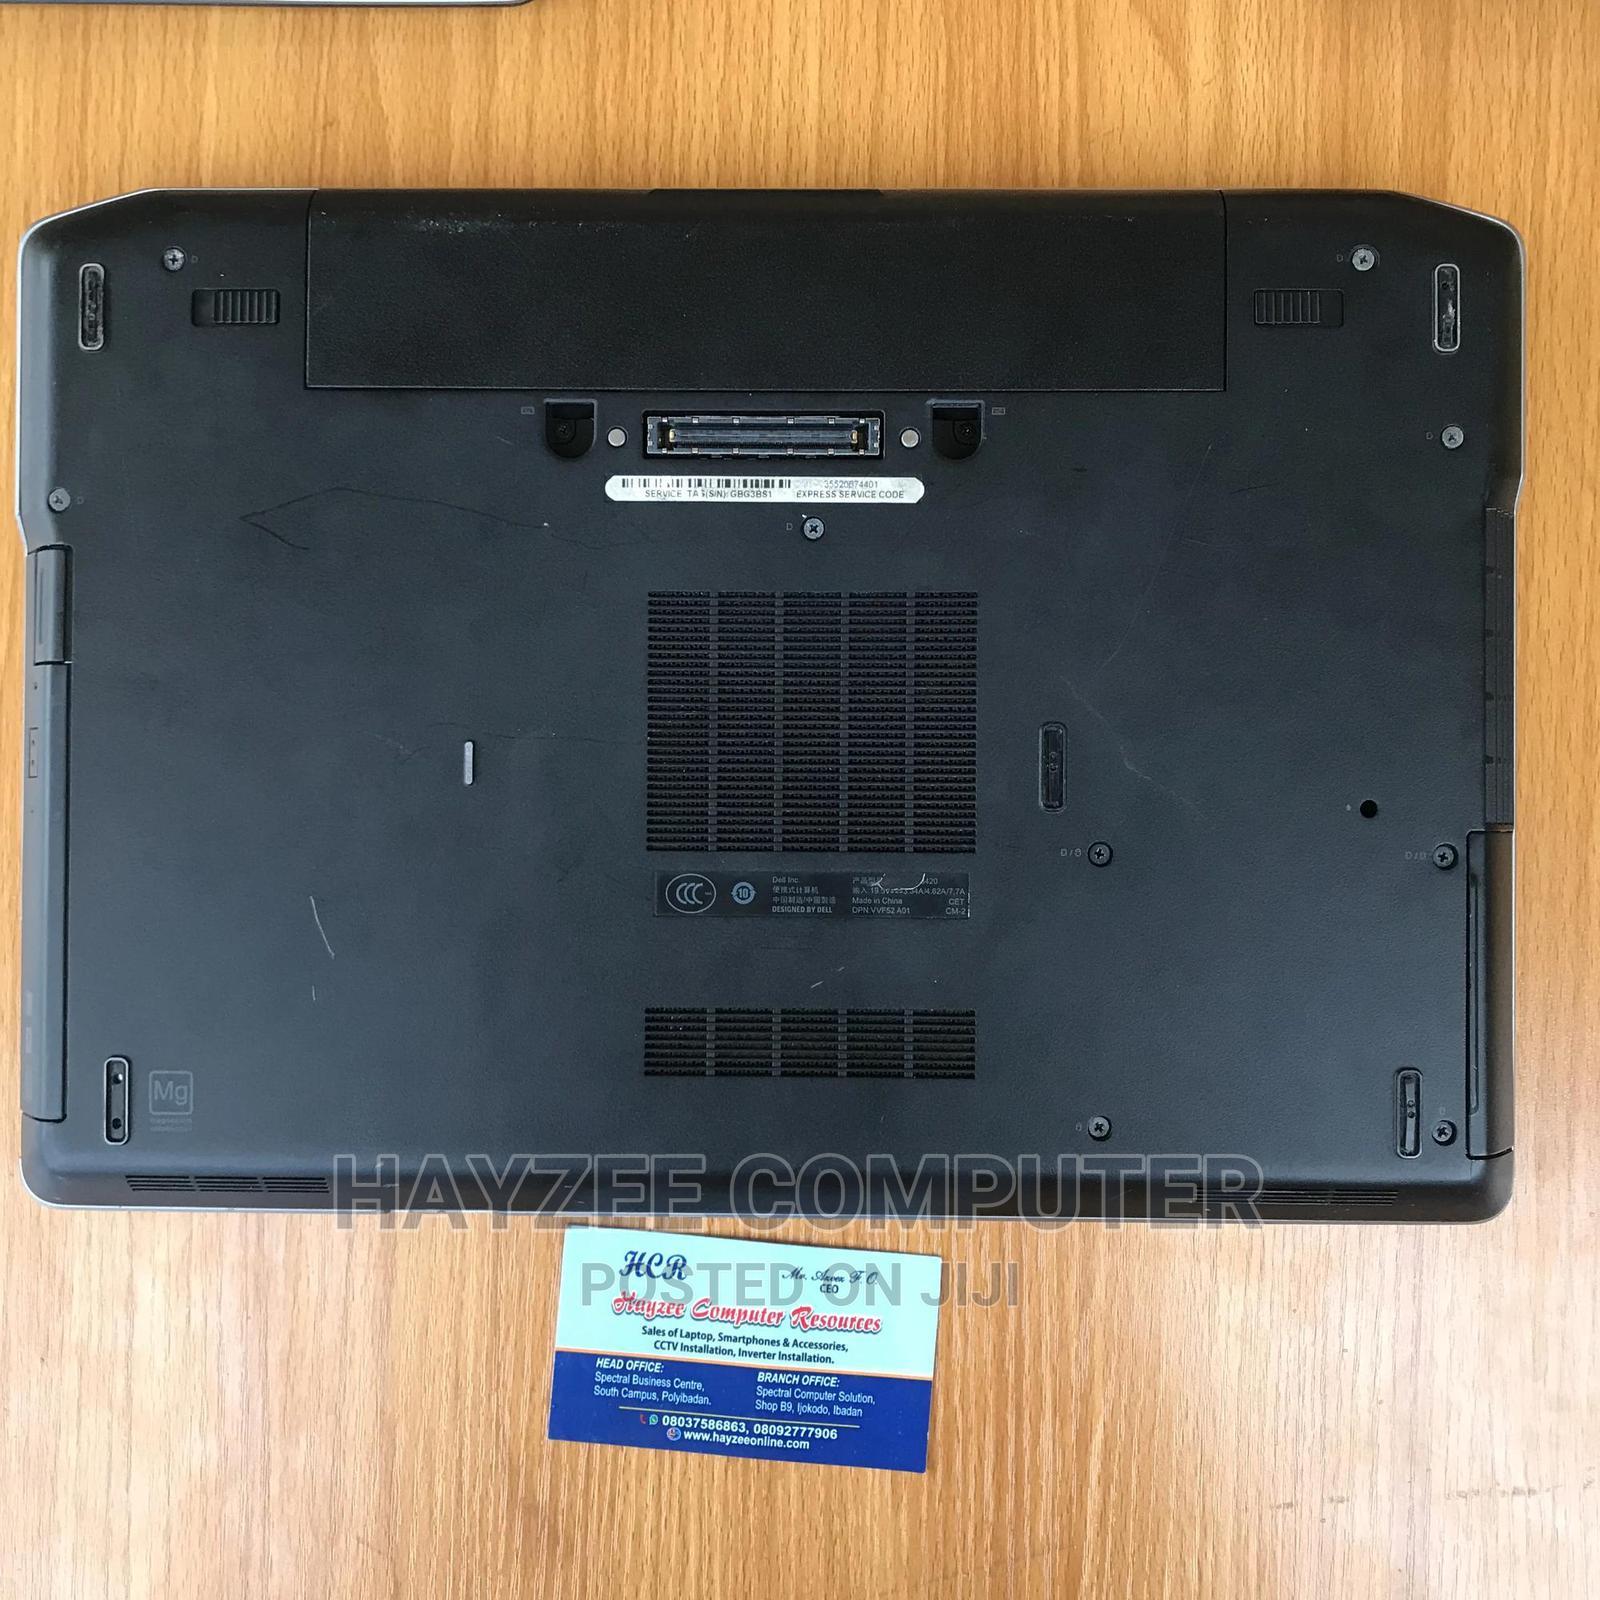 Laptop Dell Latitude E6420 4GB Intel Core I5 HDD 250GB | Laptops & Computers for sale in Ibadan, Oyo State, Nigeria